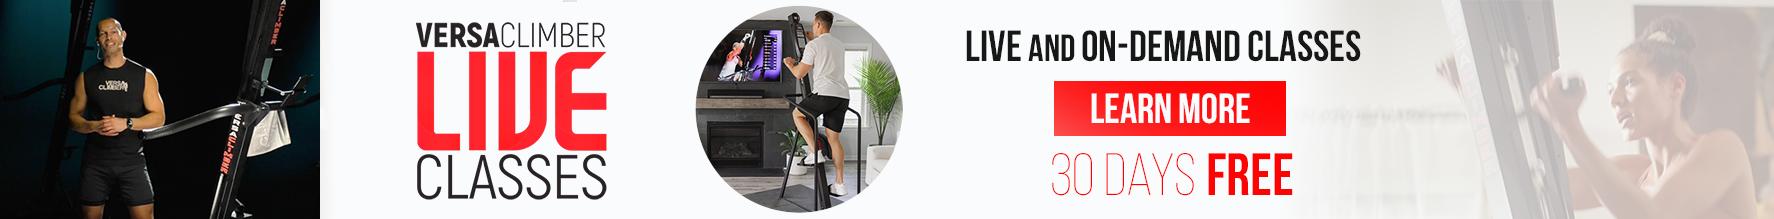 top header banner VC LIVE